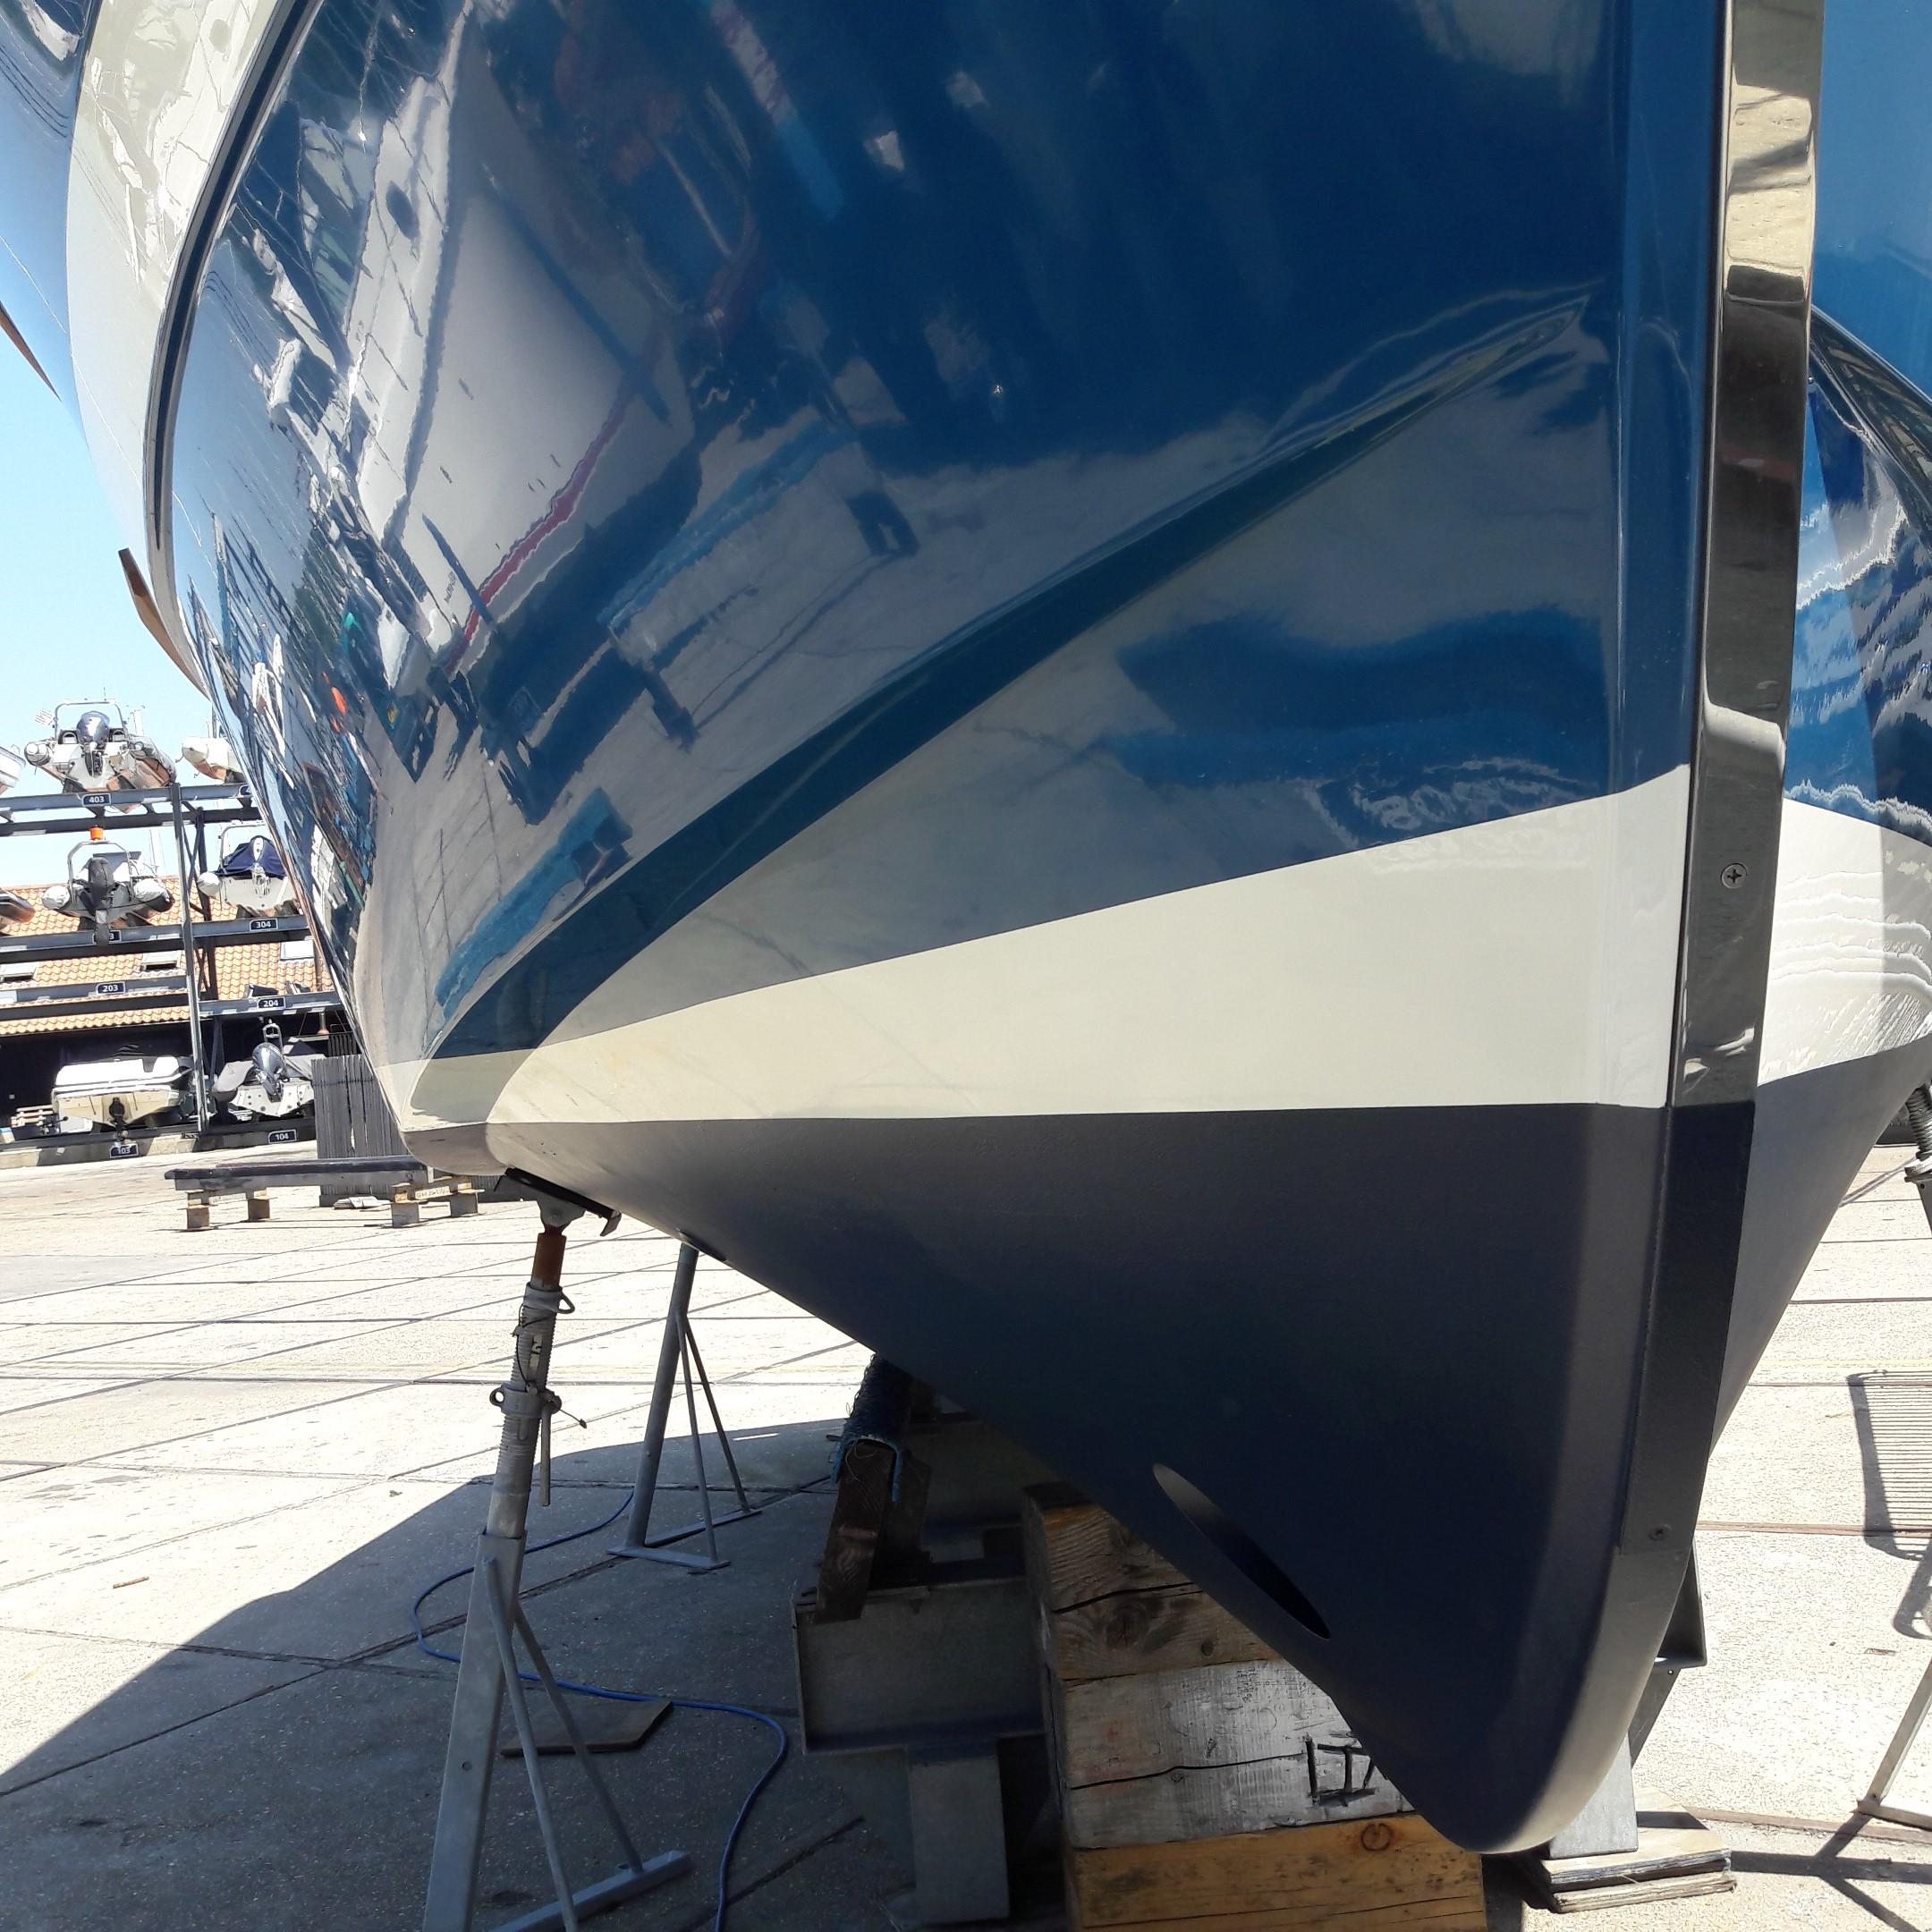 Rhea 730 Timonier - hull shape